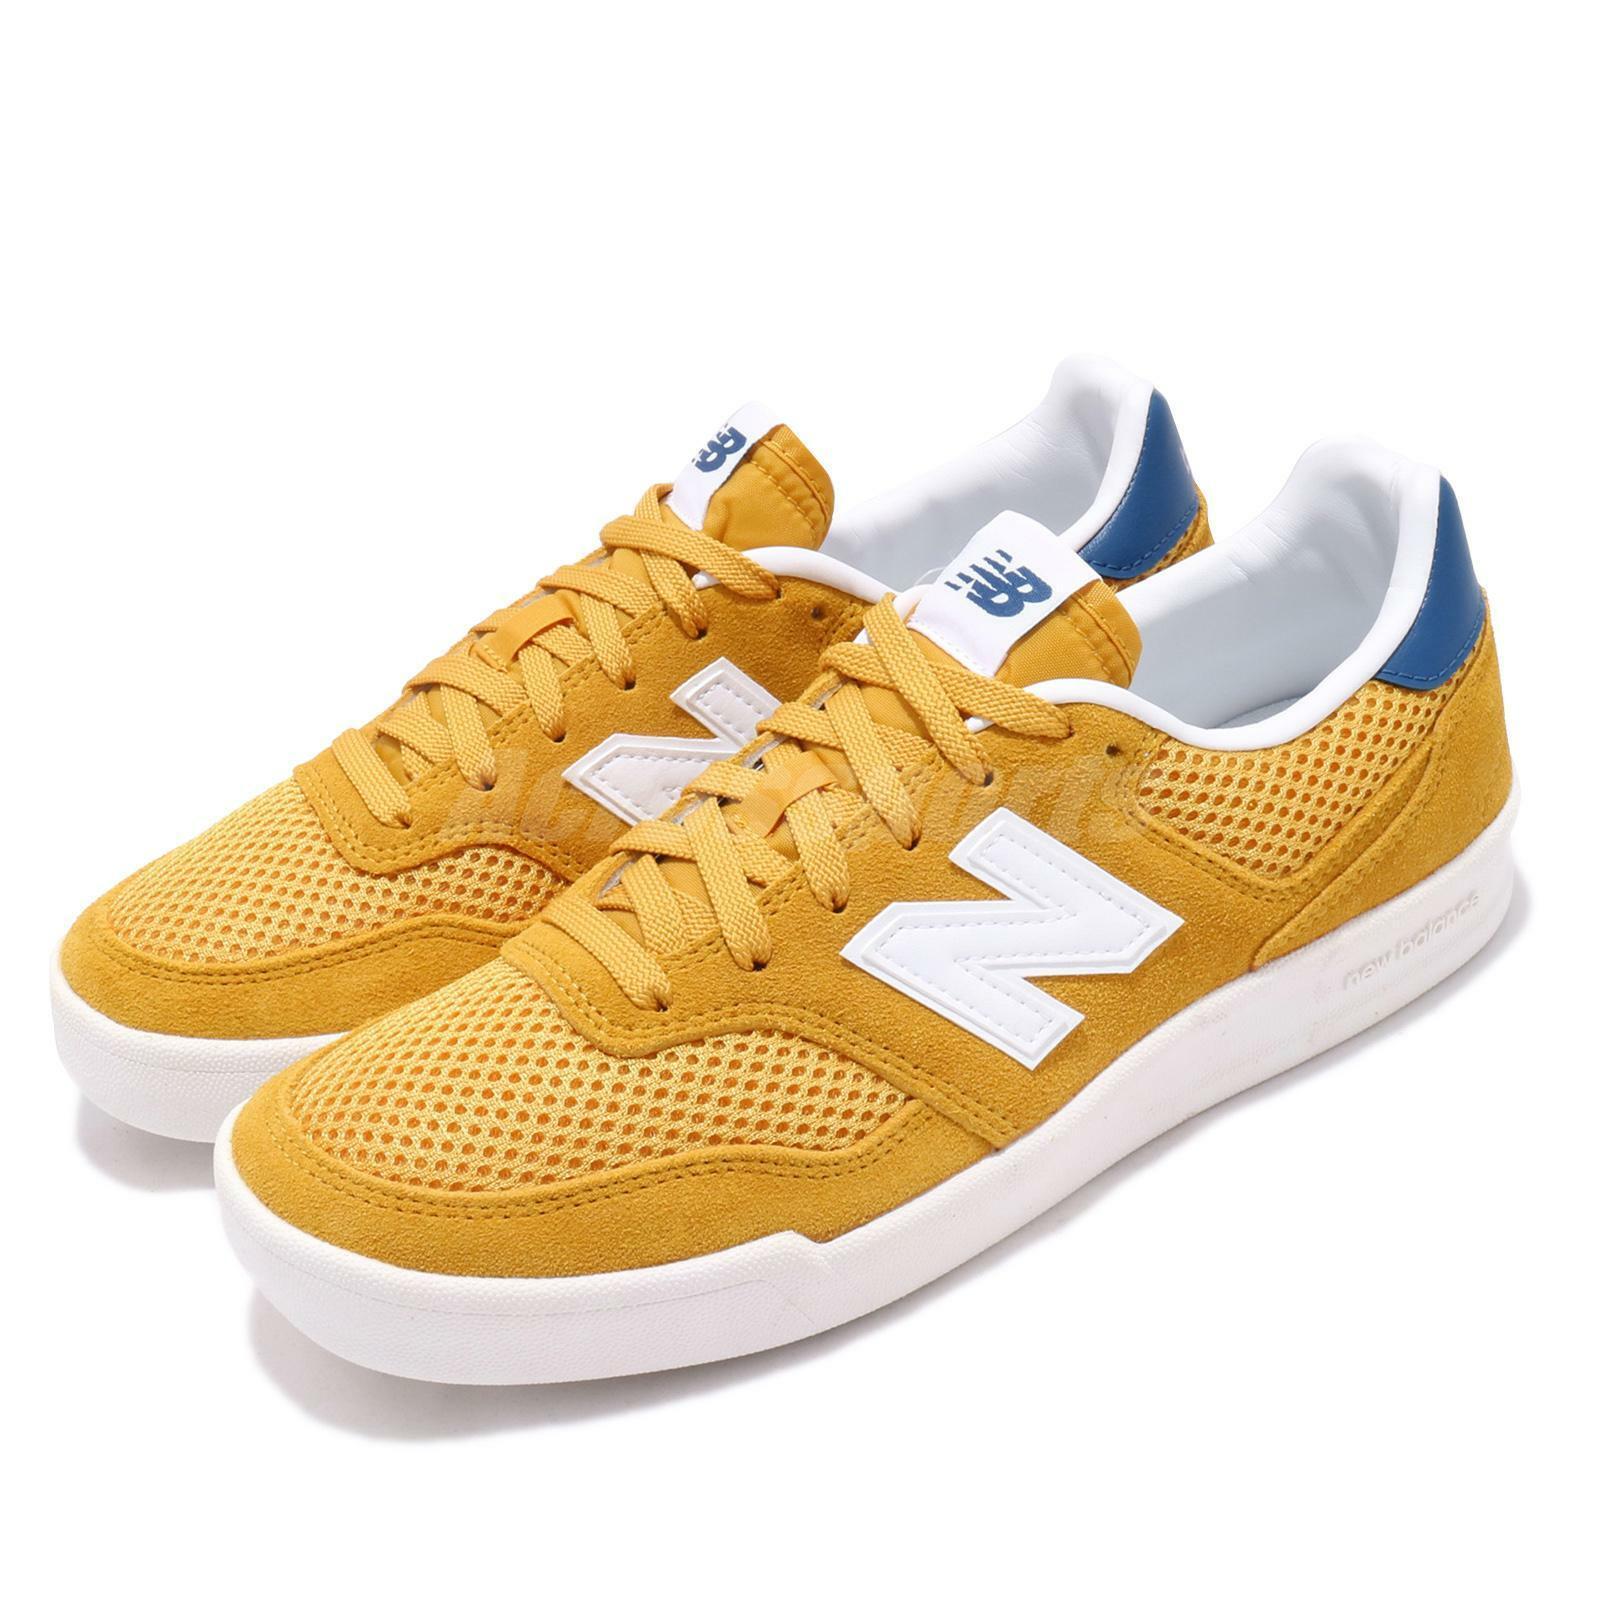 New Balance CRT300B2 CRT300B2 CRT300B2 D amarillo blancoooooo azul Men mujer Unisex Casual zapatos CRT300B2D d9343b